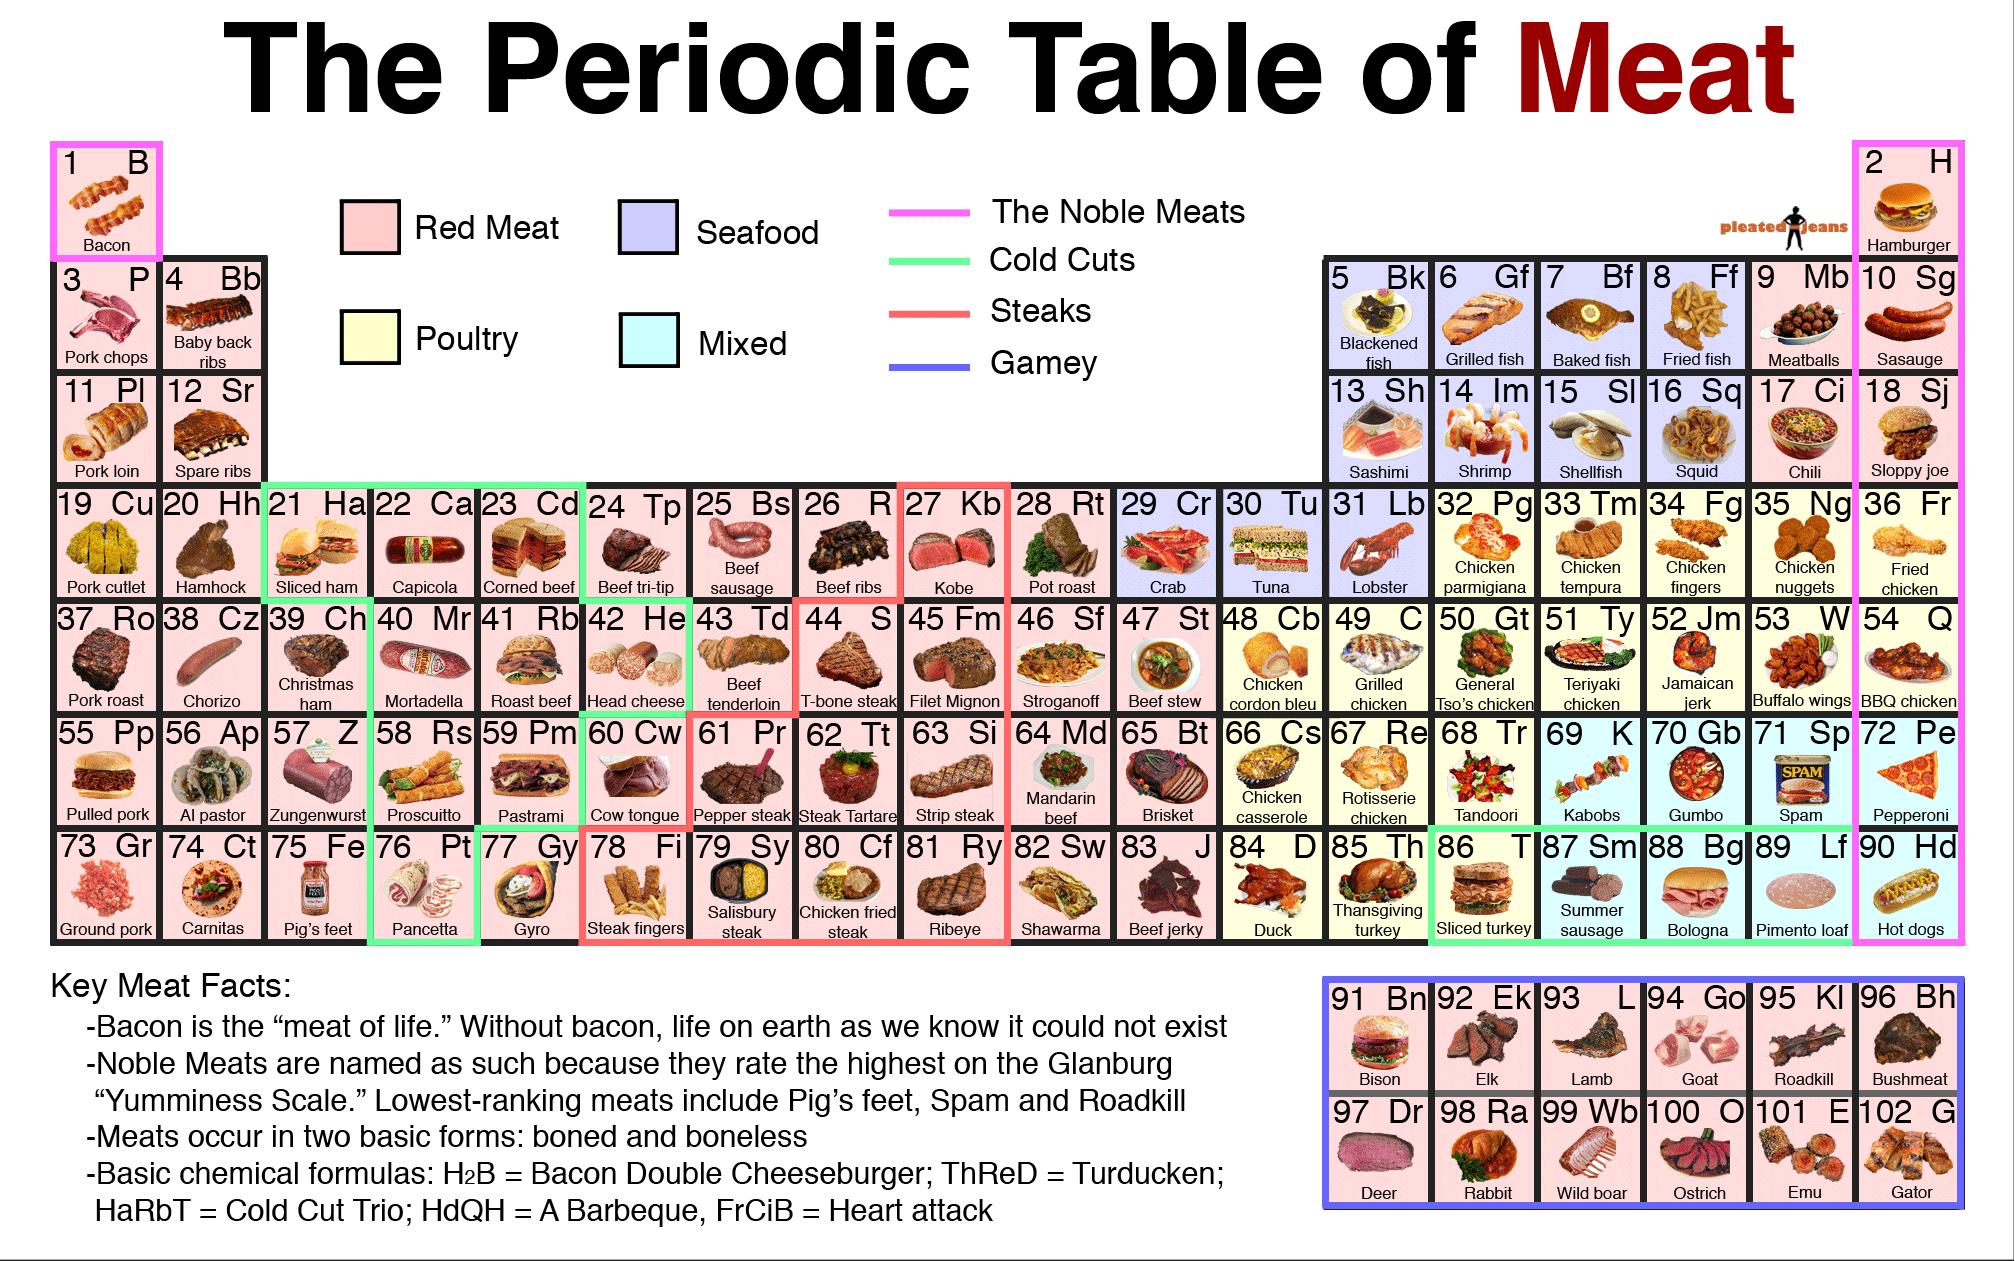 https://pleatedjeans.files.wordpress.com/2010/07/periodic-table-of-meat.png